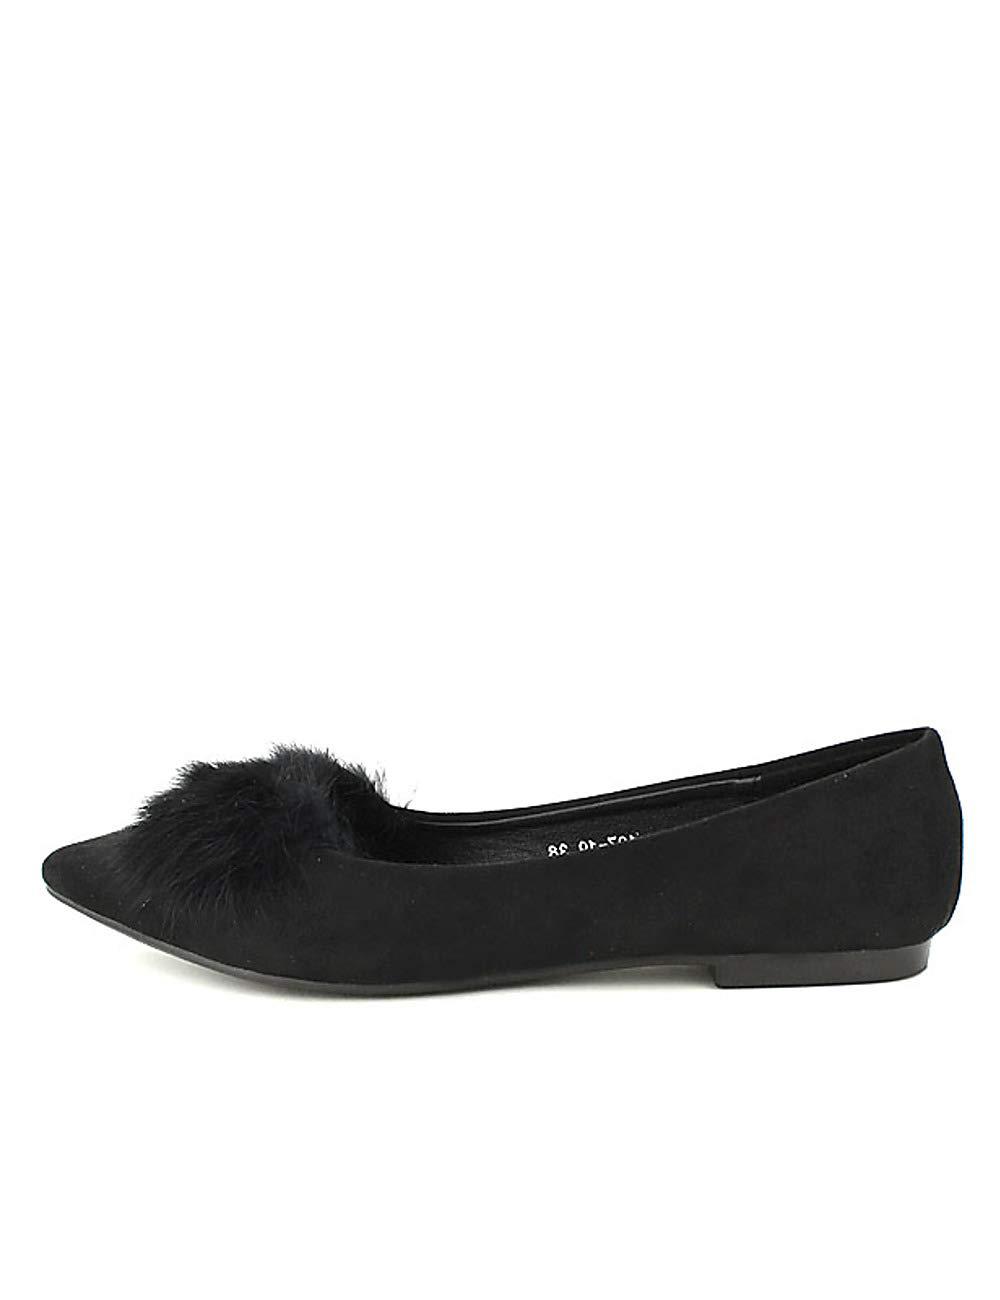 Cendriyon, Ballerines Noires MULANKA Chaussures Fourrure Chaussures 19995 Femme Femme Noir 33bee26 - jessicalock.space